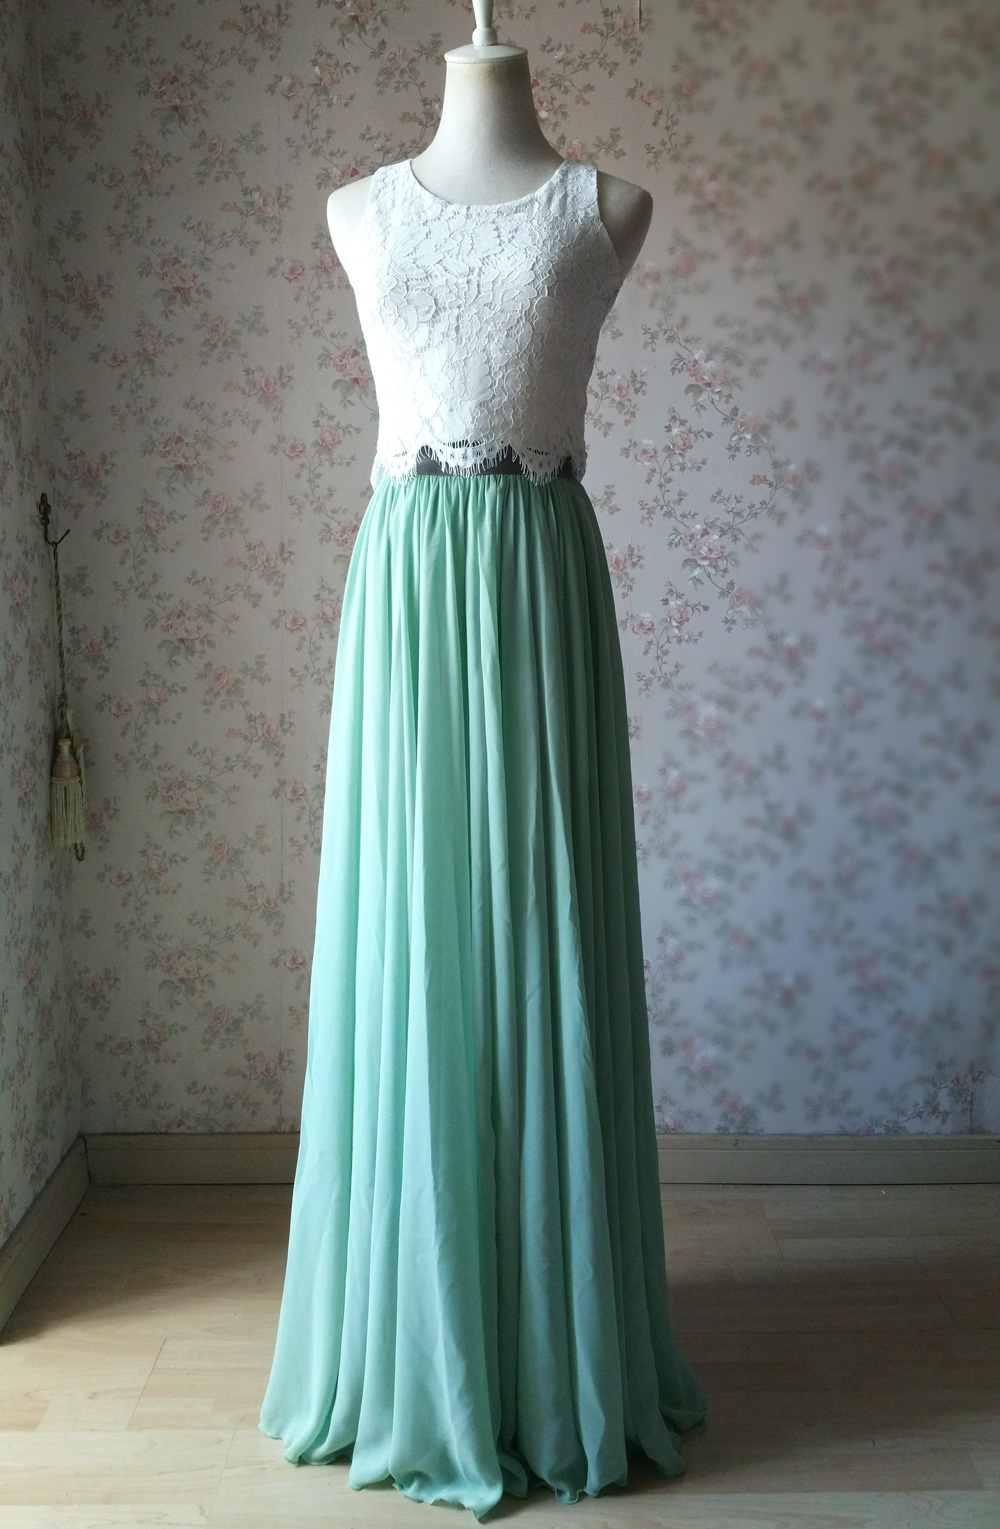 White lace top tank dressromantic 1000 1